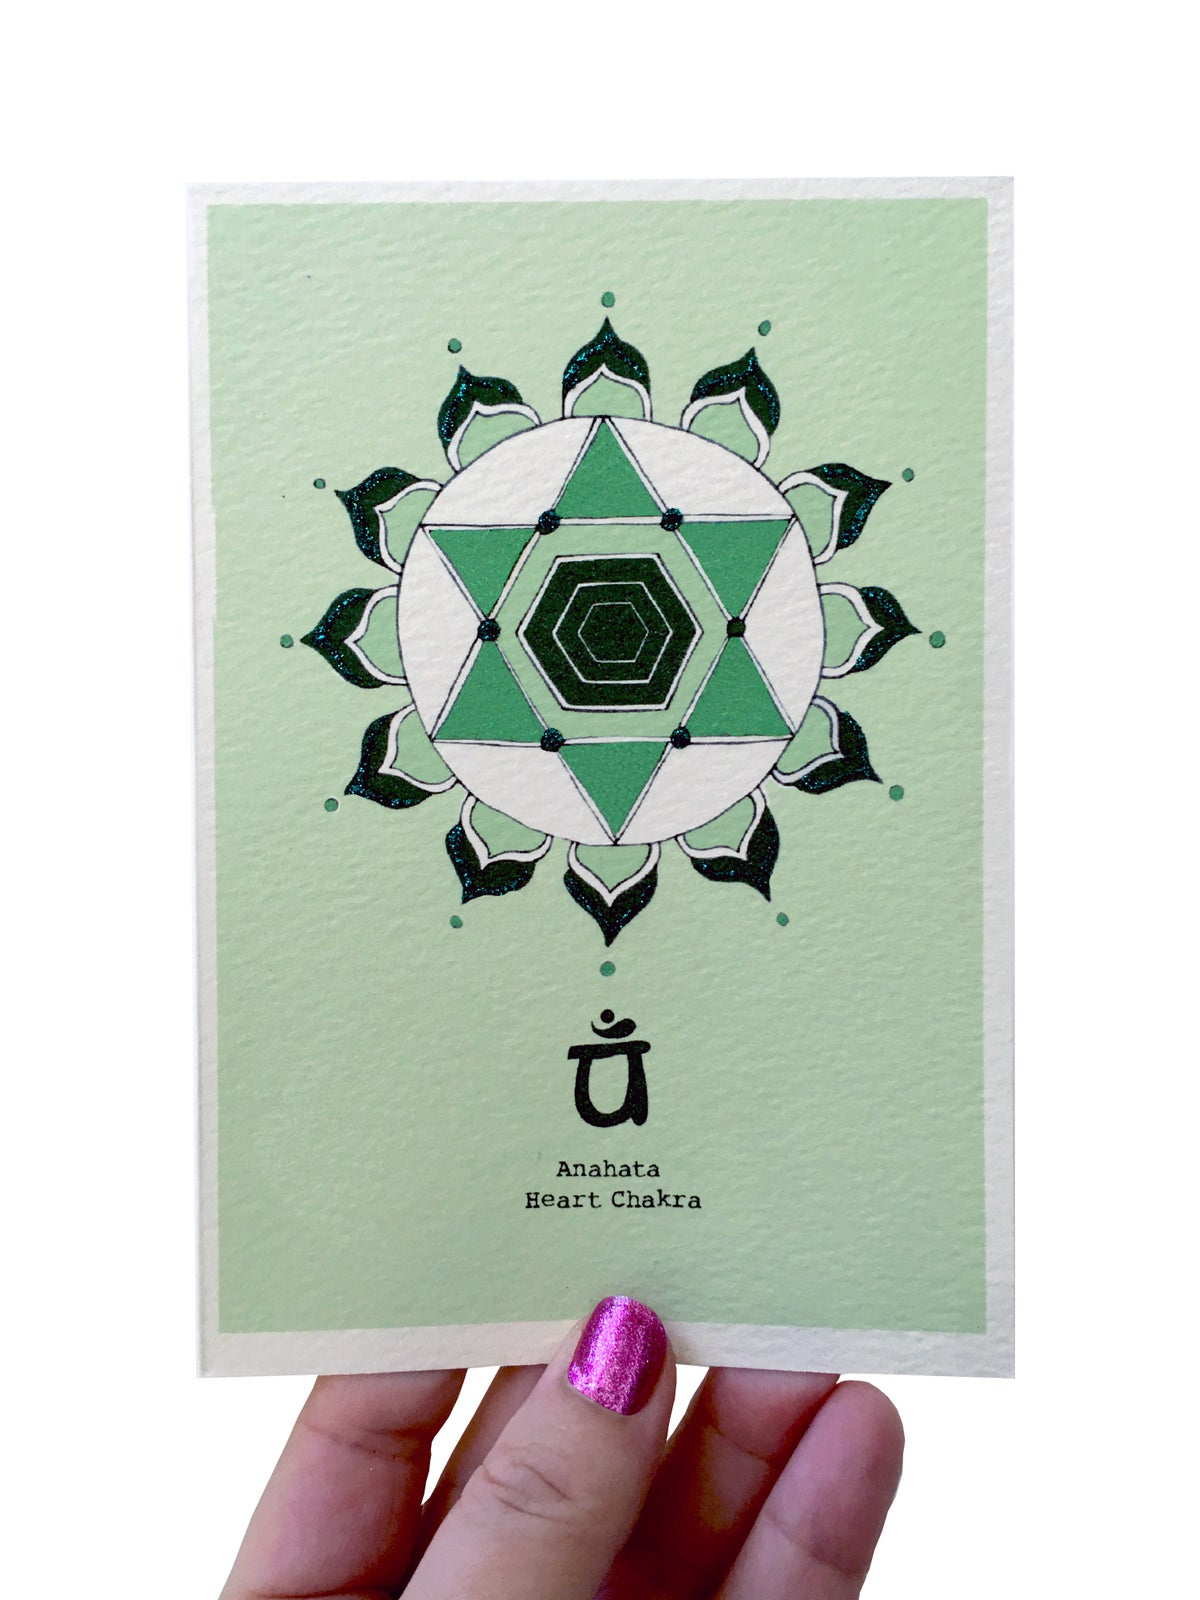 Heart Chakra Card